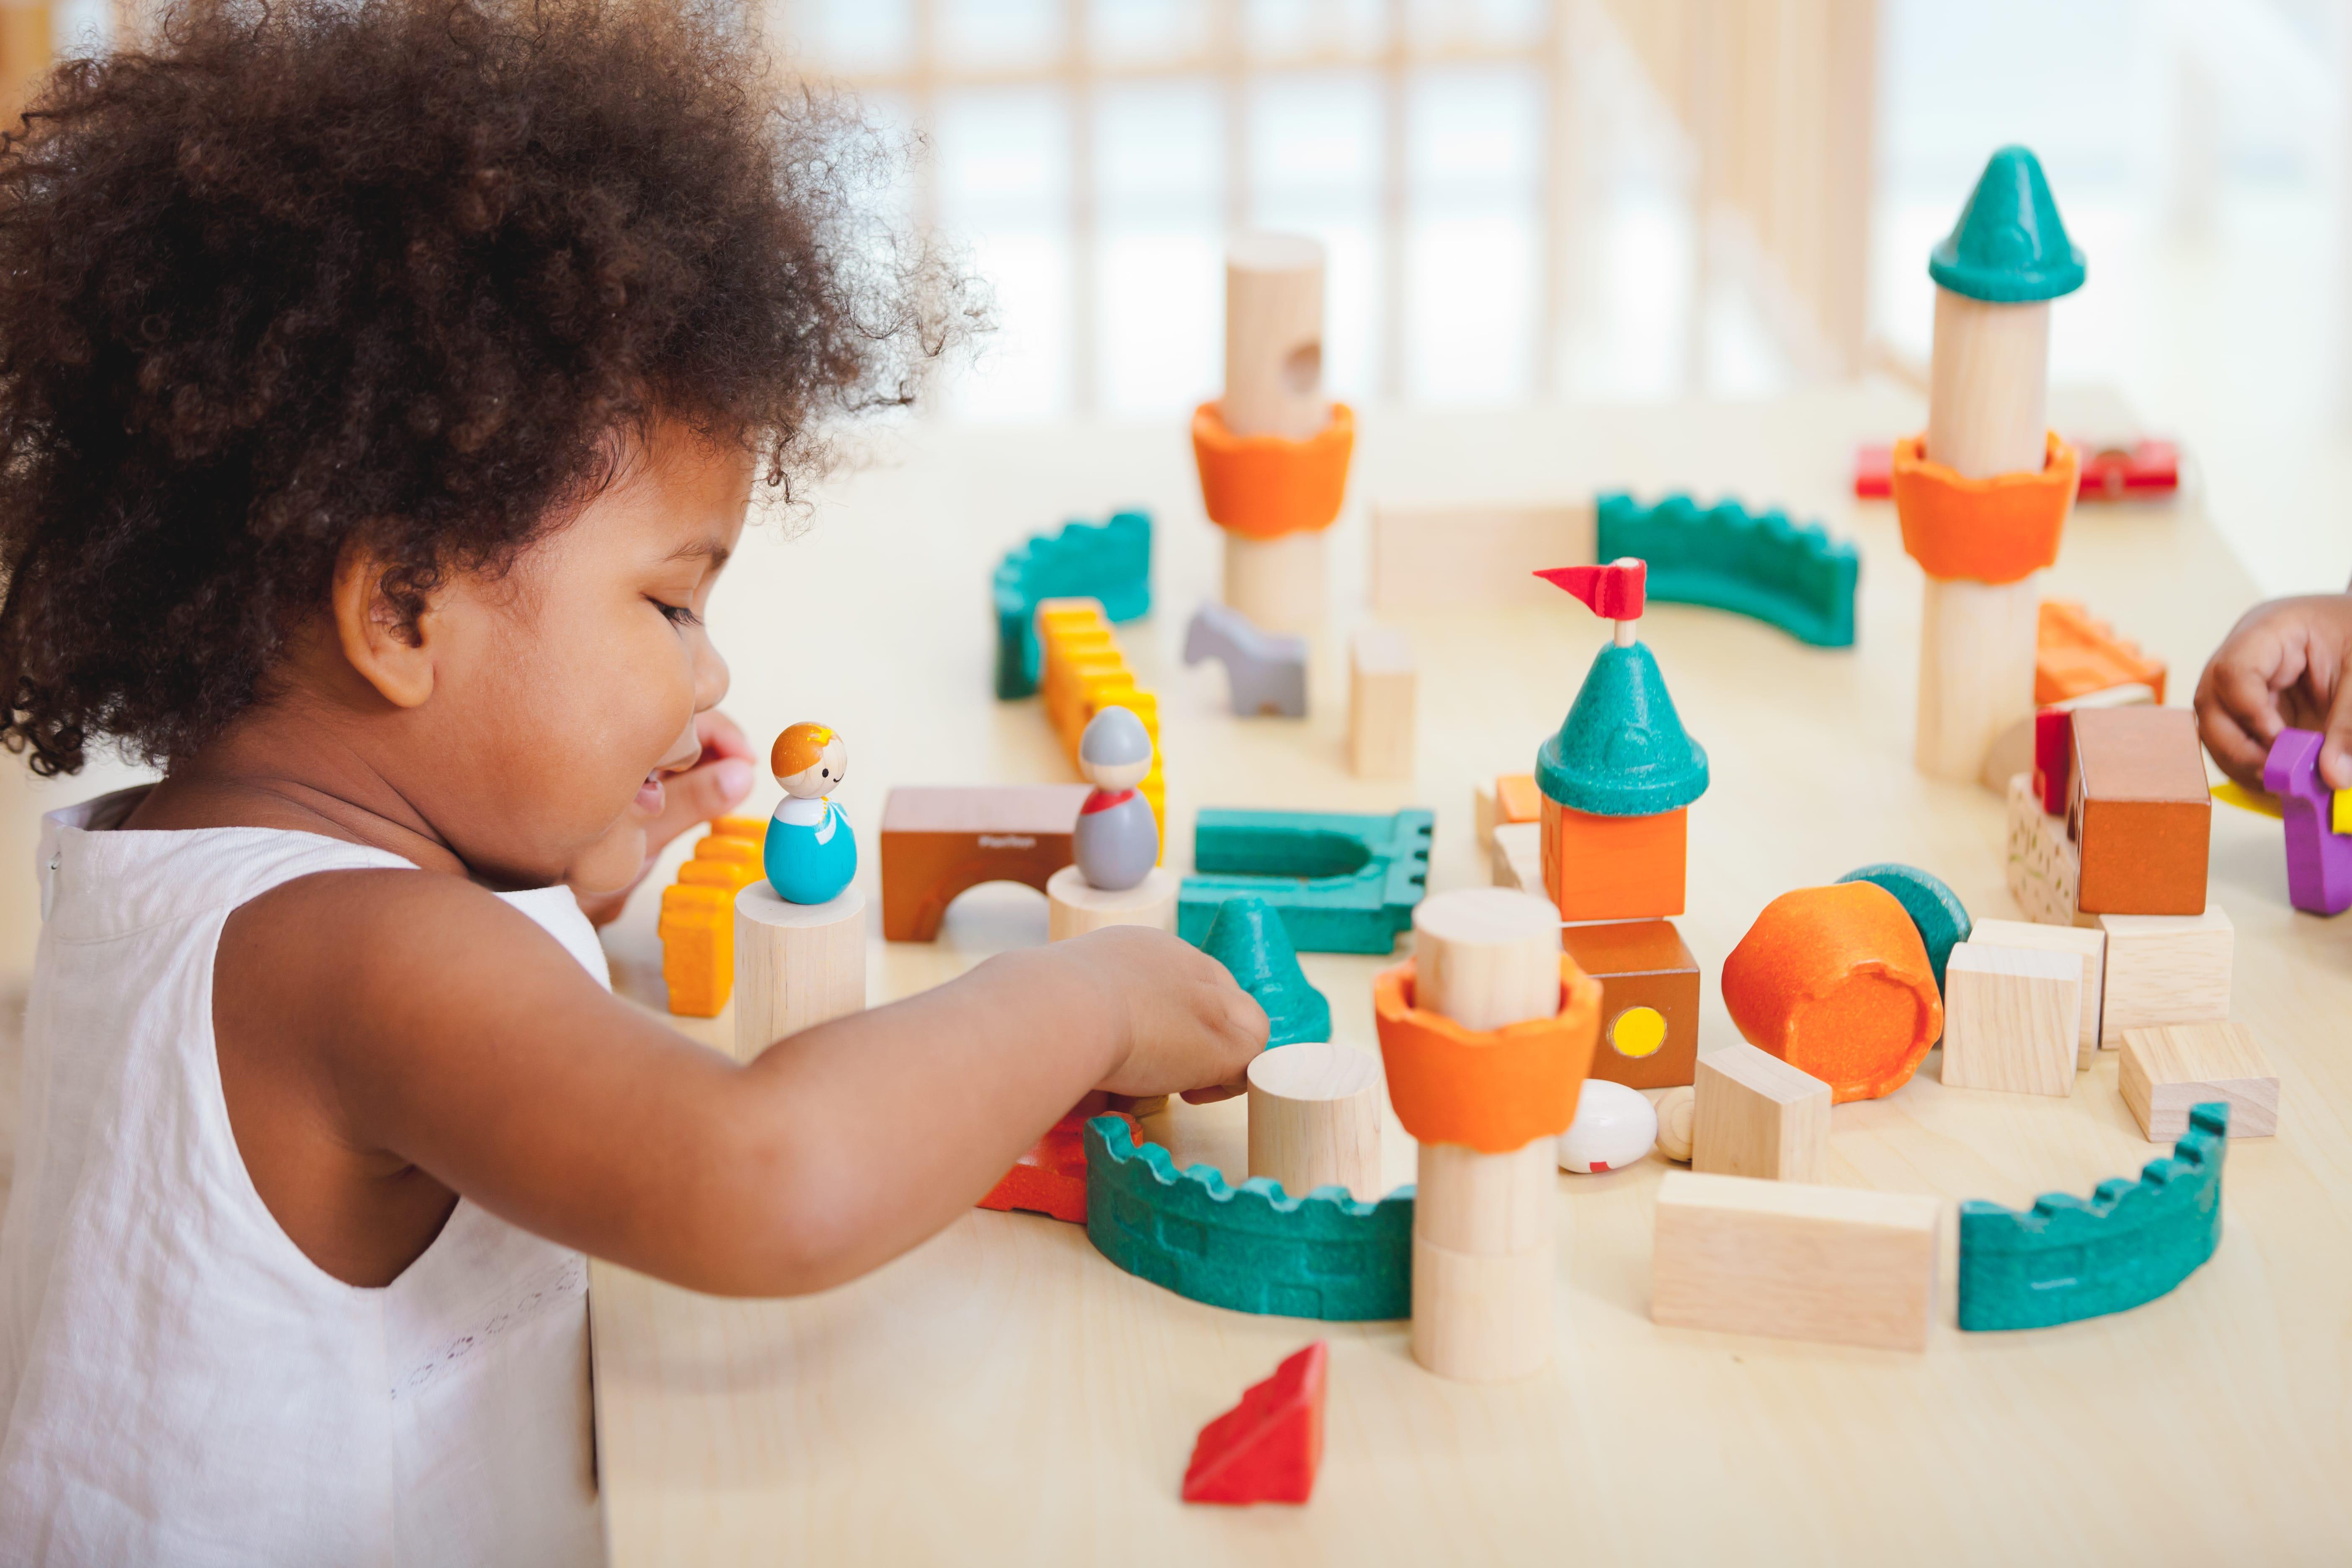 5696_PlanToys_FANTASY_BLOCKS_Blocks_and_Construction_Fine_Motor_Coordination_Creative_Tactile_3yrs_Wooden_toys_Education_toys_Safety_Toys_Non-toxic_5.jpg